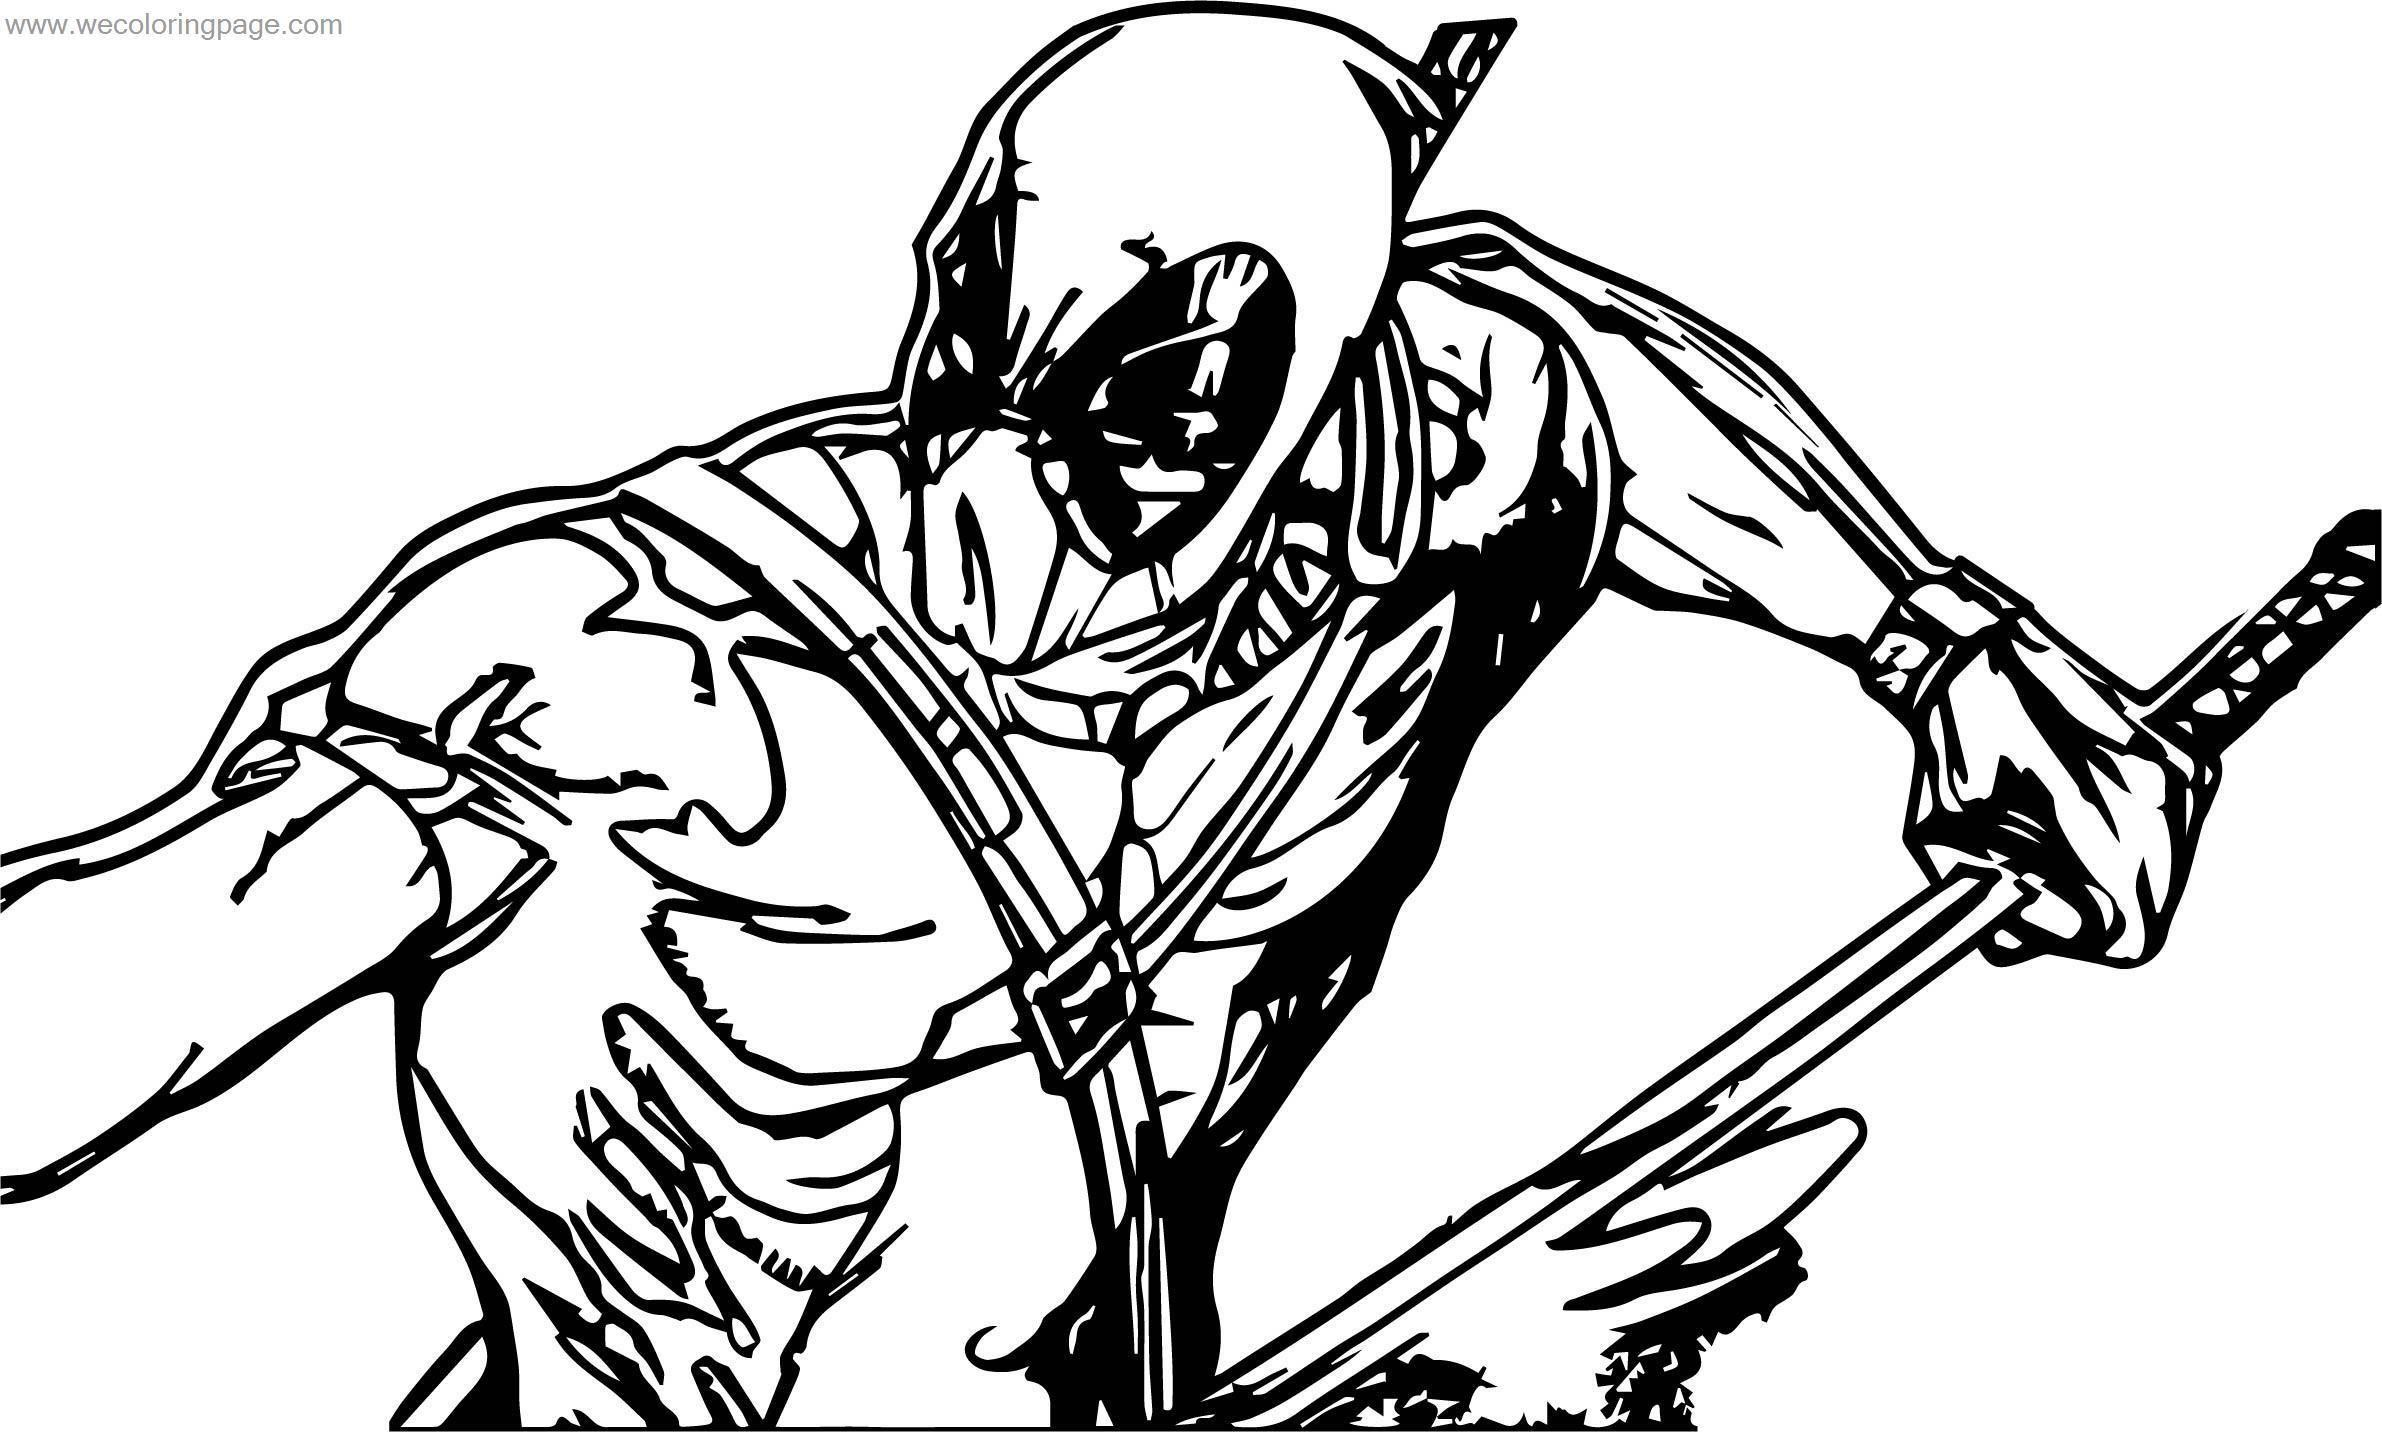 When Deadpol Coloring Page